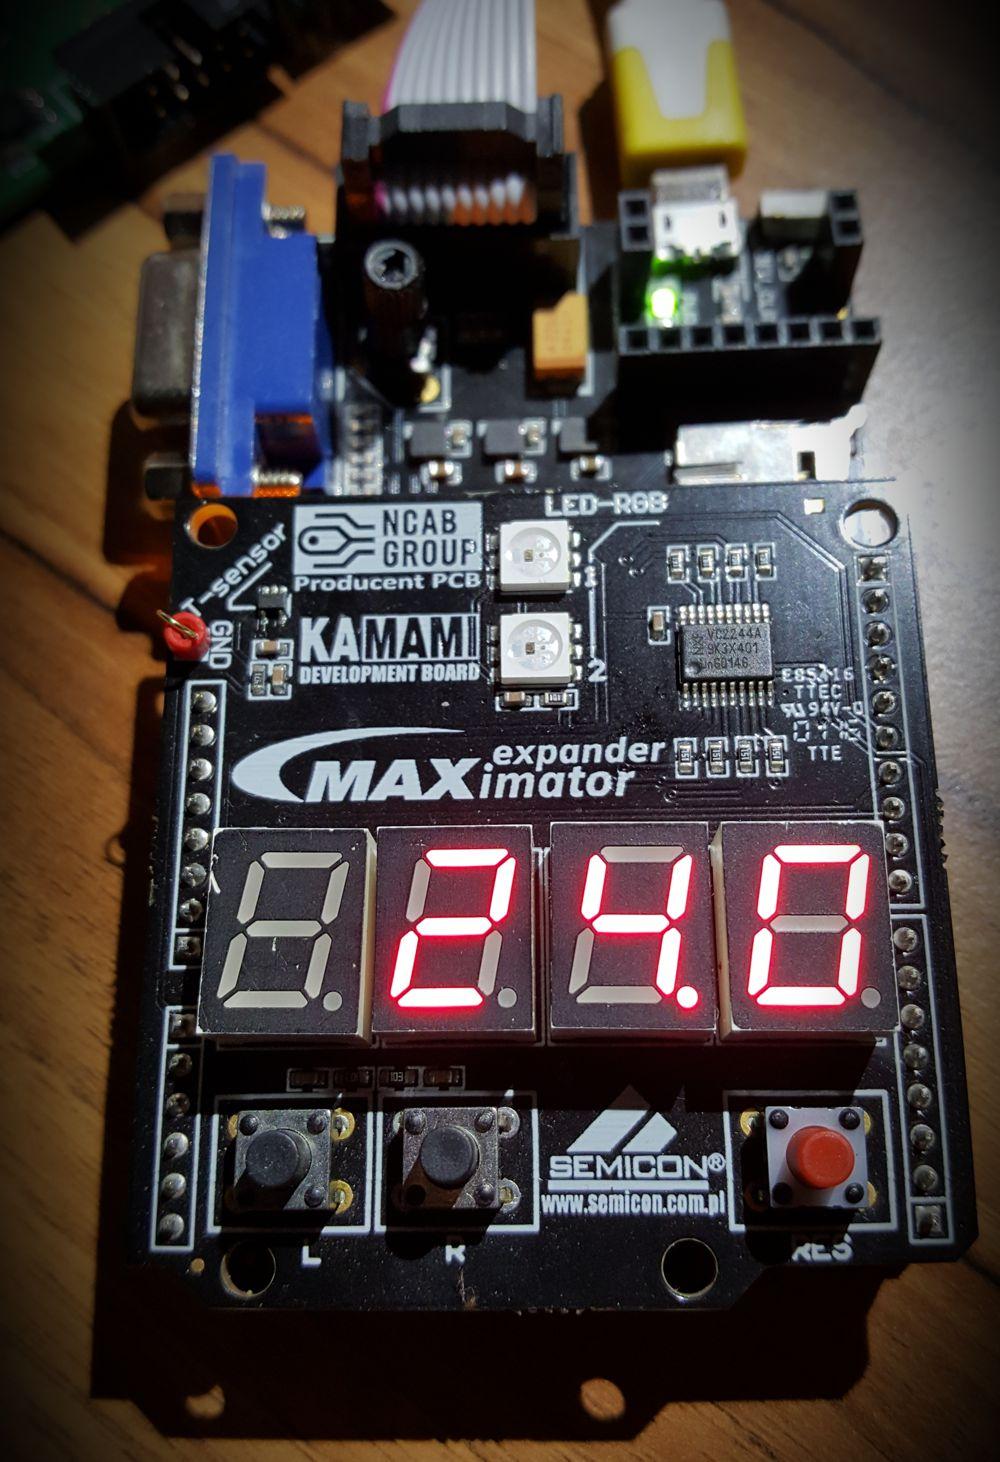 termometr-maximator-stlm20